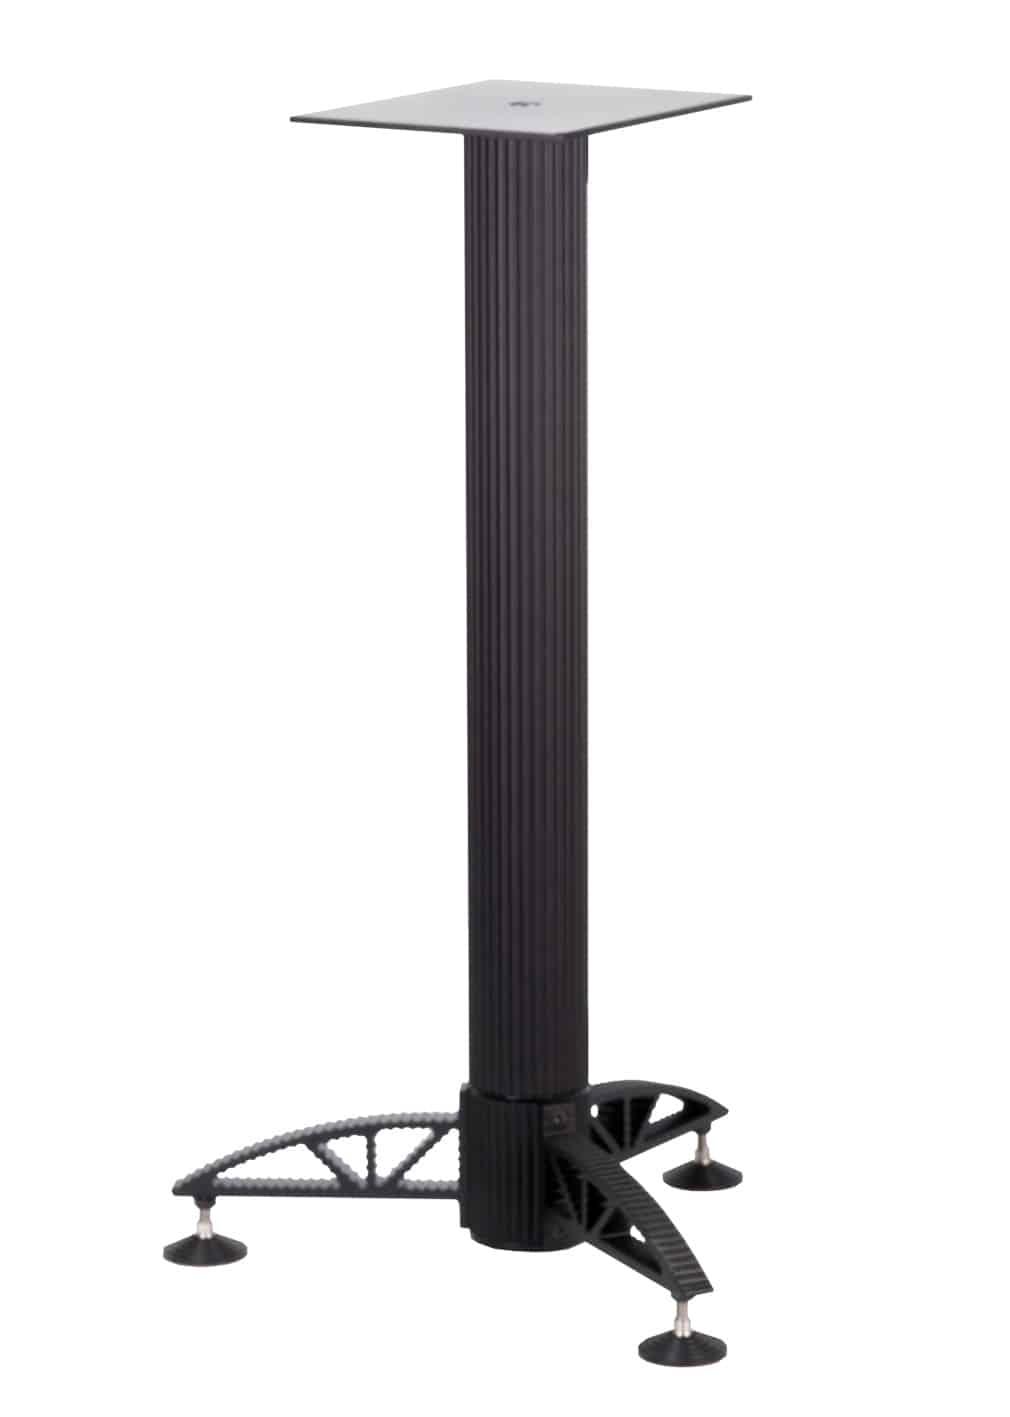 Loudspeaker stand Model 5 Image